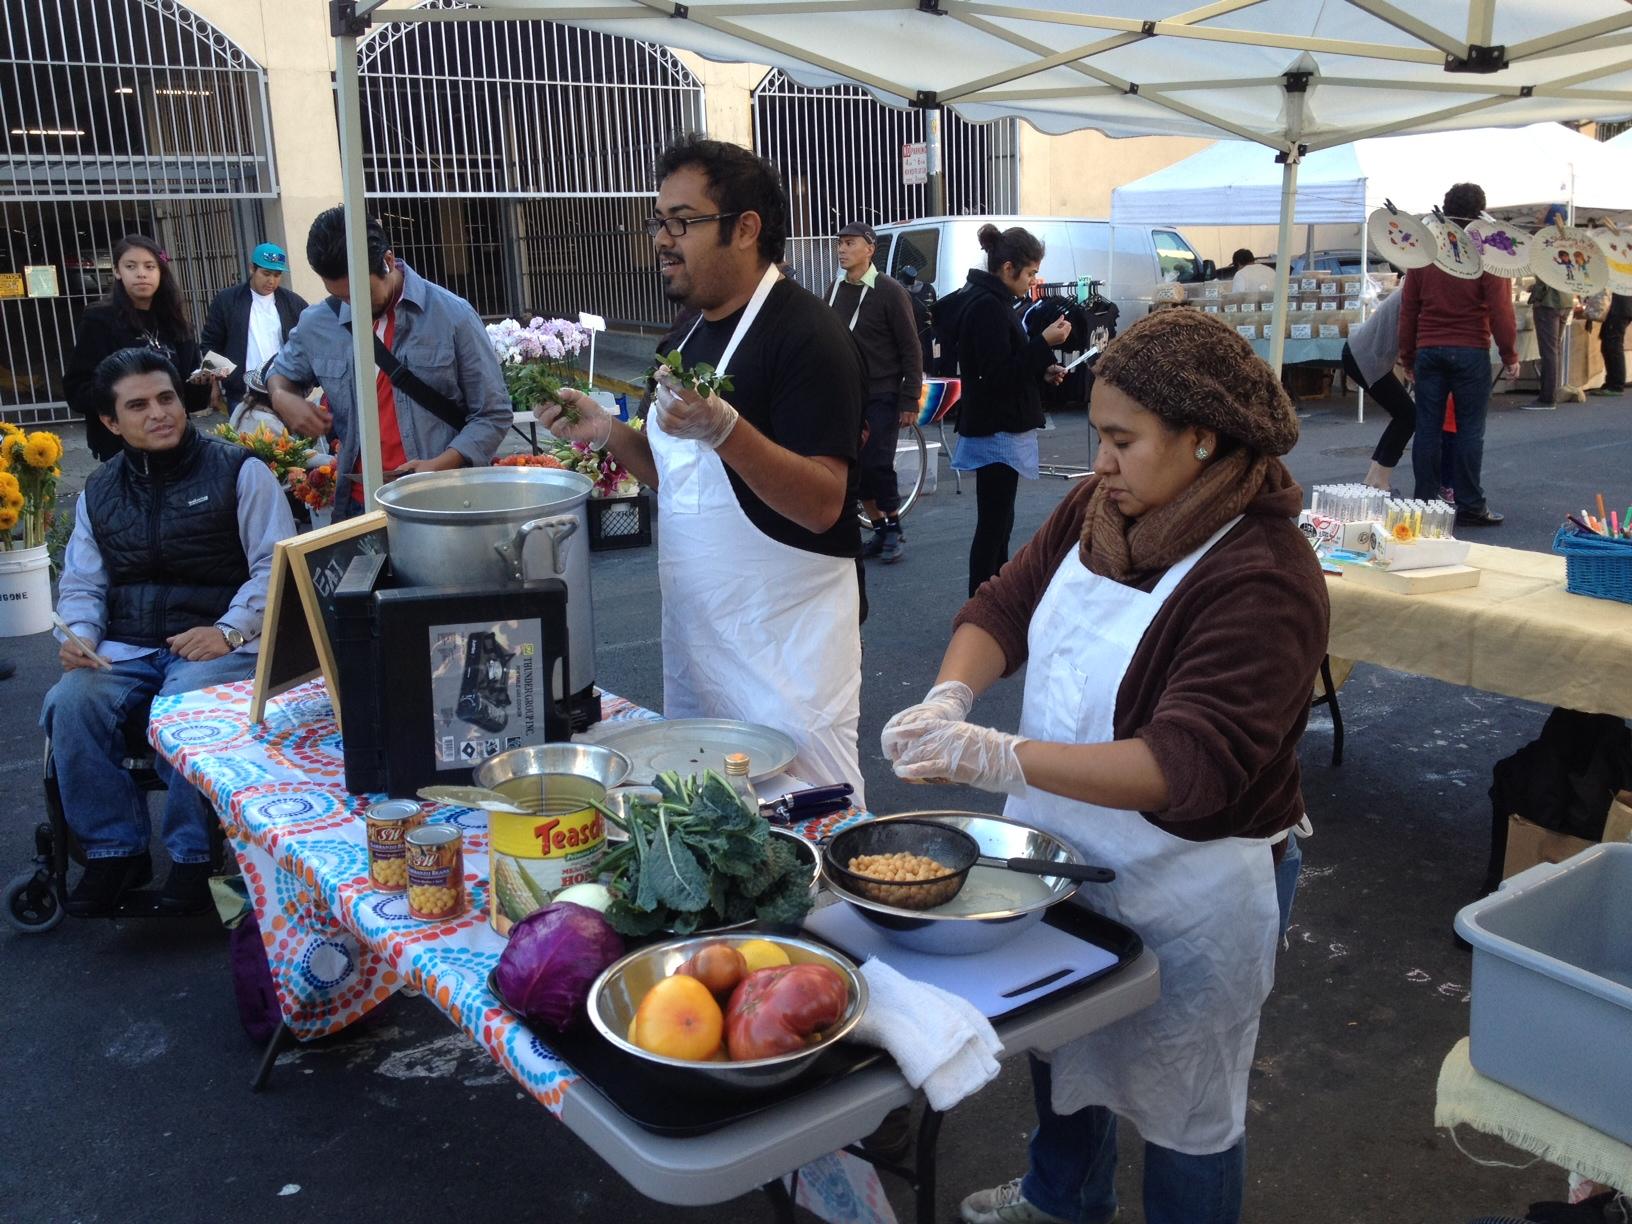 SNAP: Mission Community Market